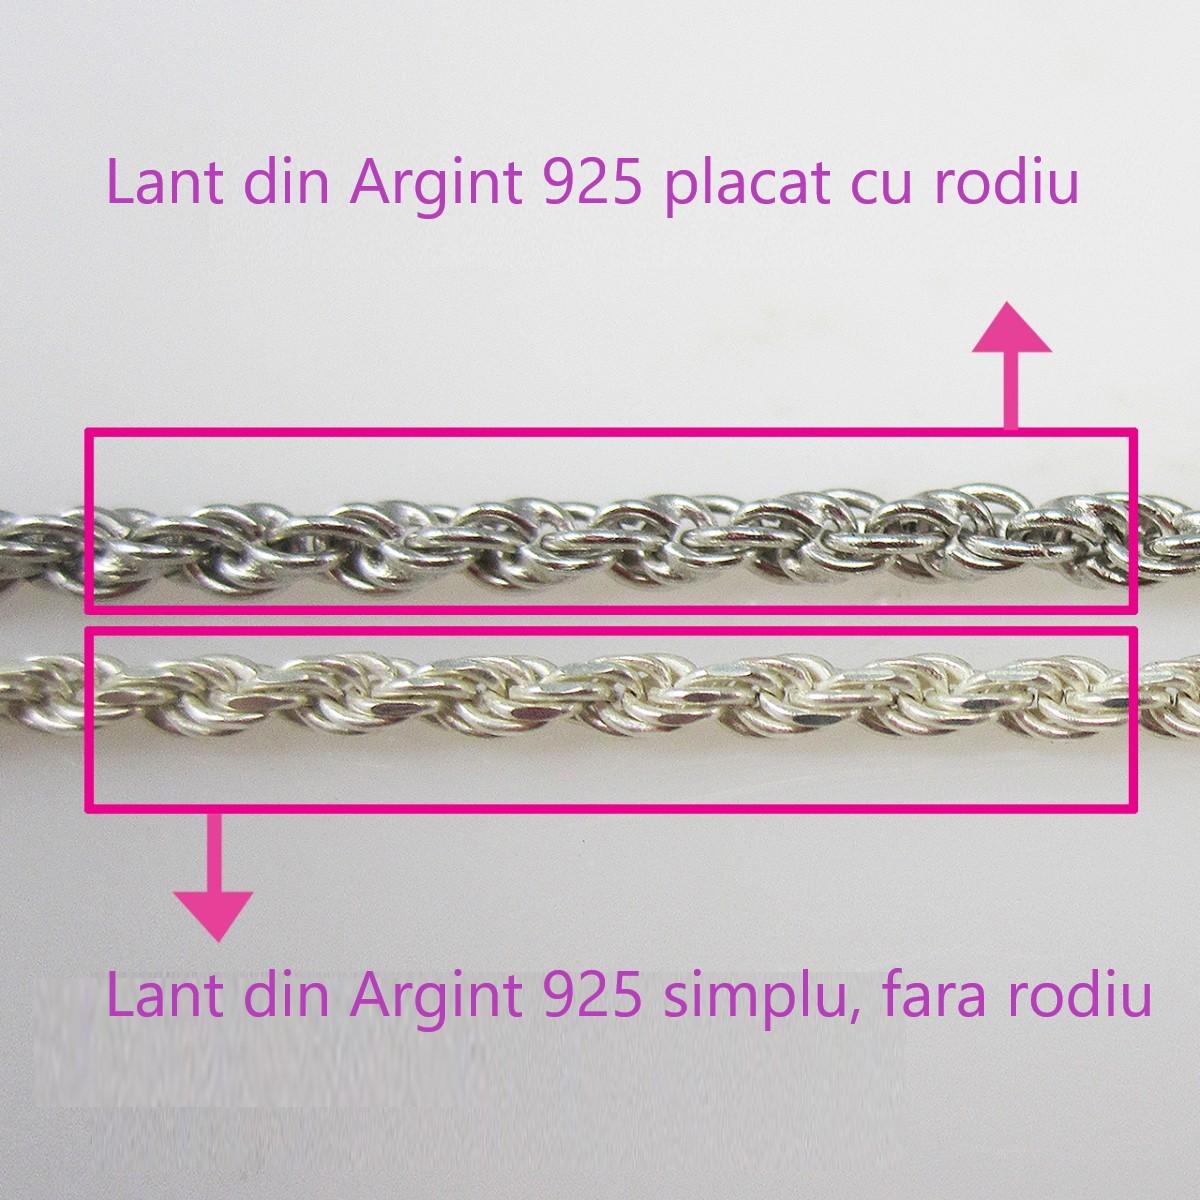 bijuterii-argint-vs-argint-rodiat